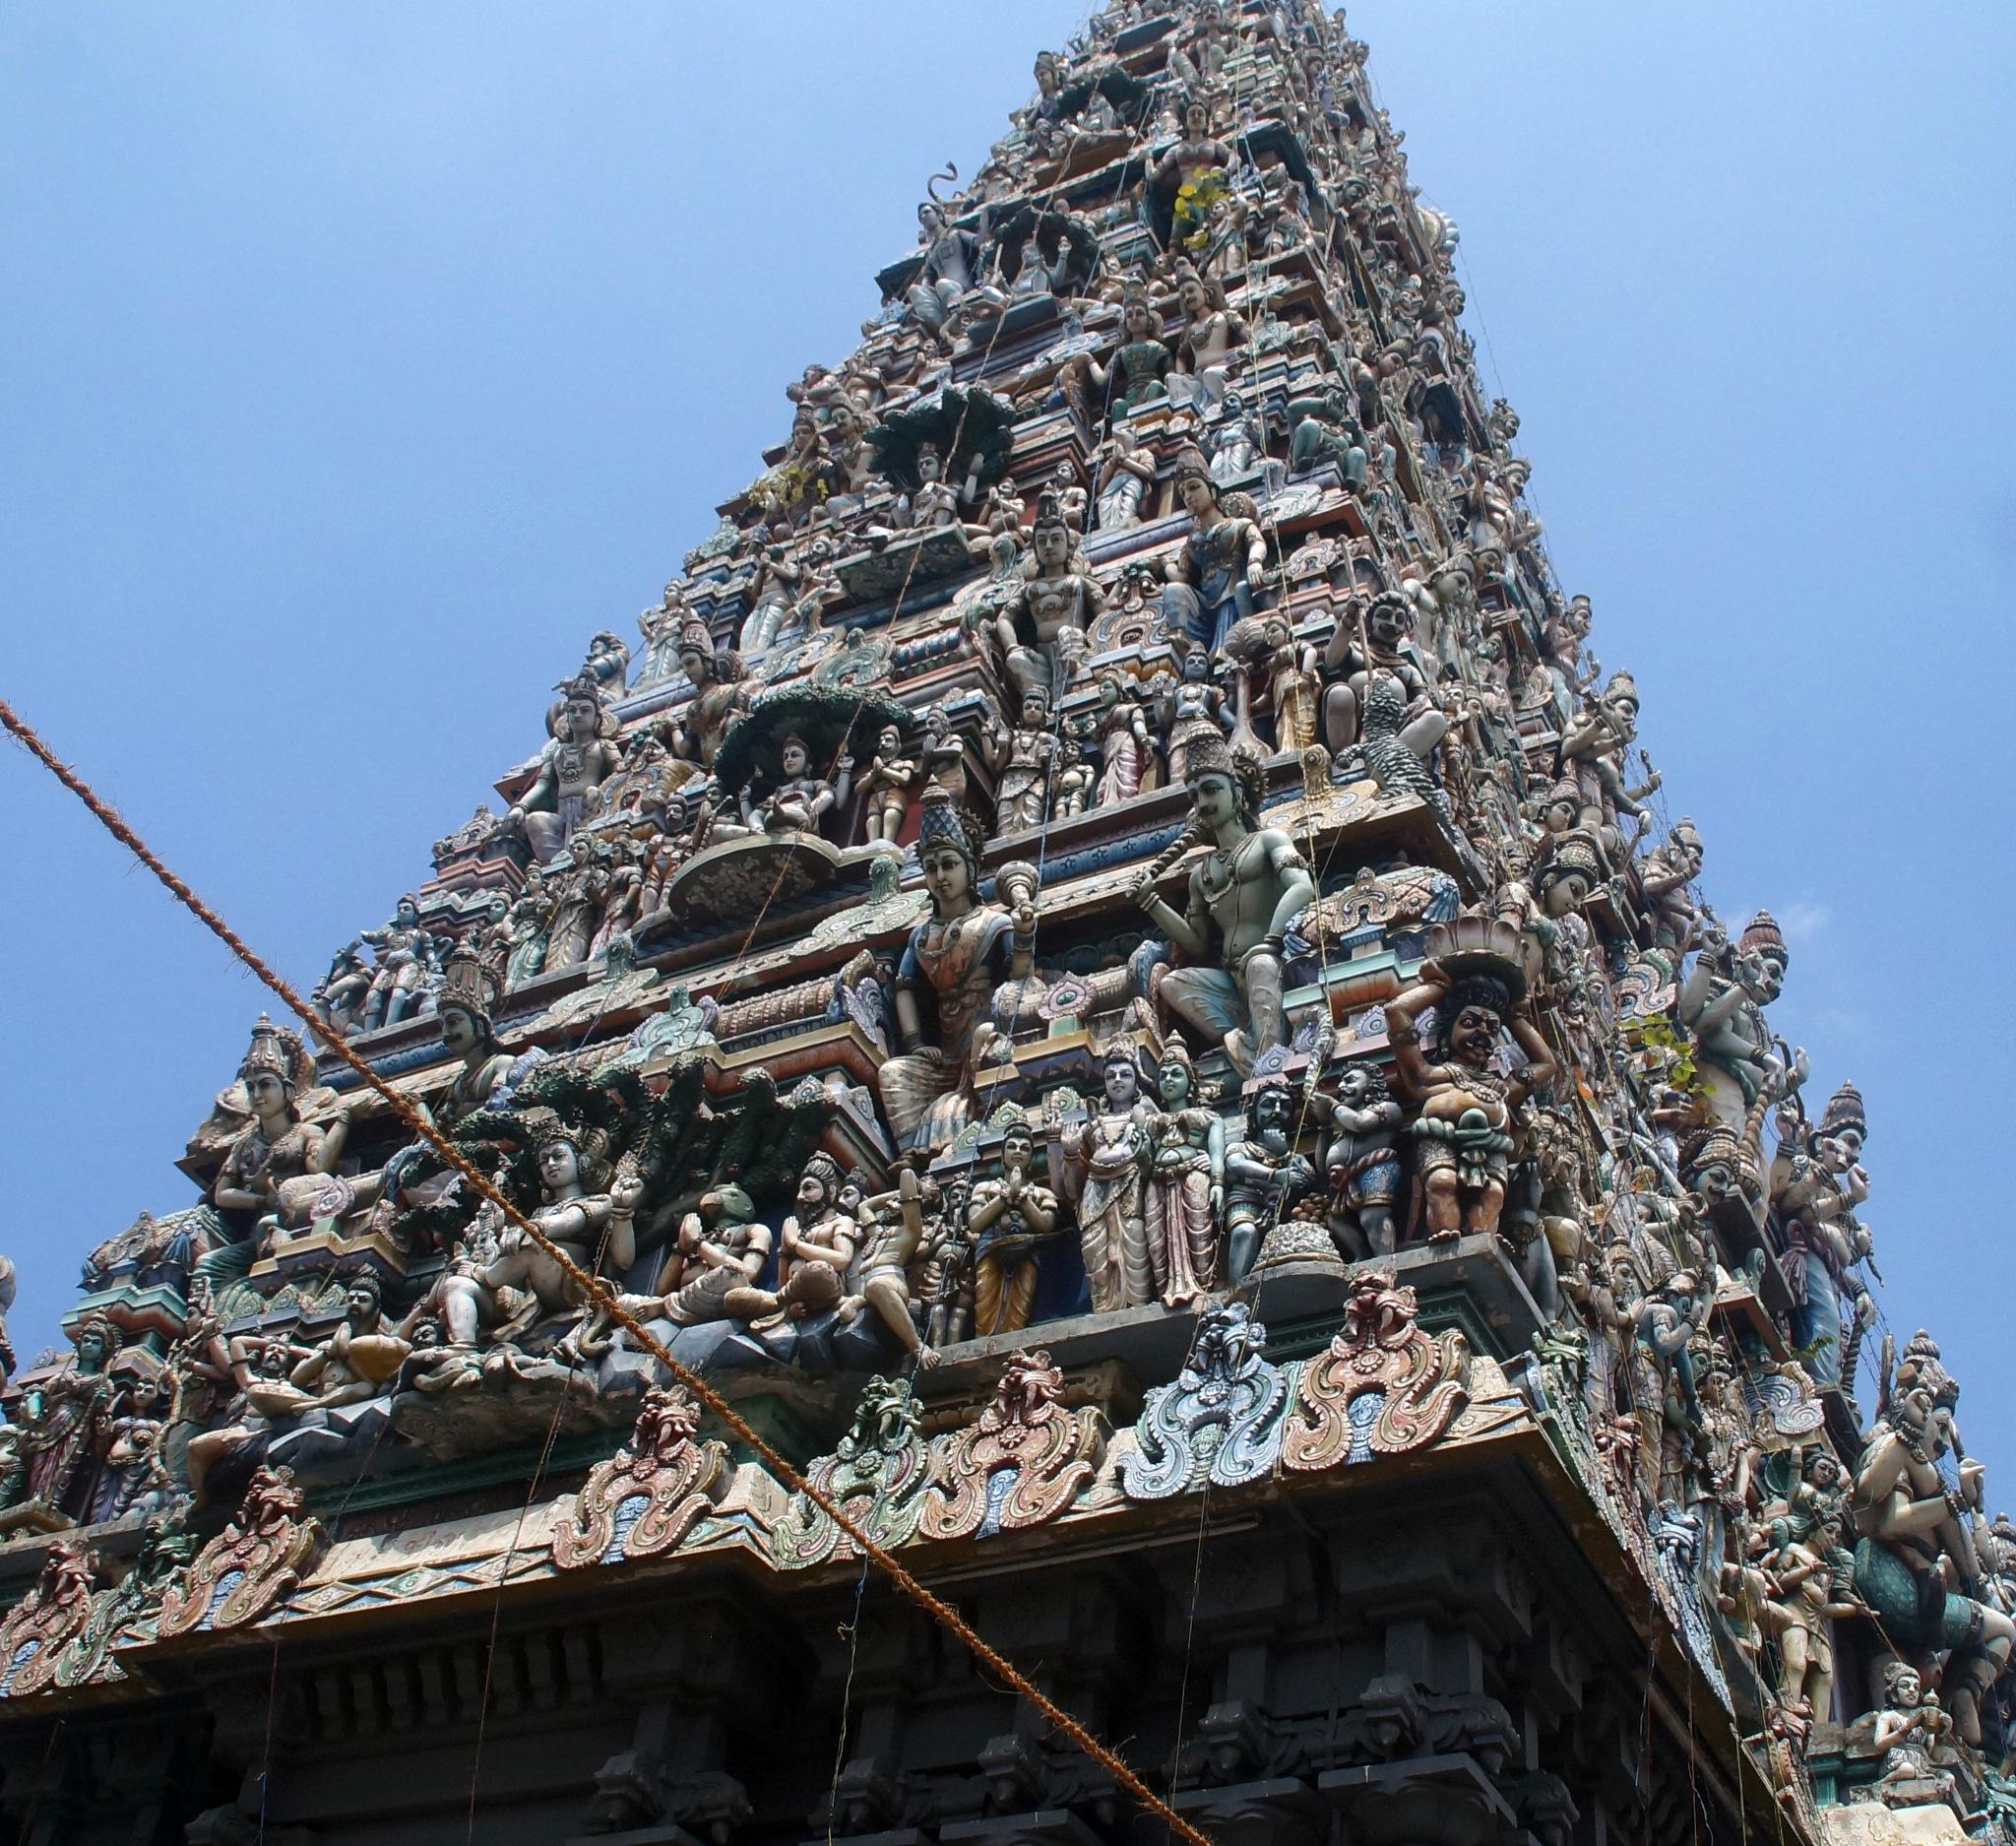 Old Hindu temple in Colombo, Sri Lanka 2018 by lars.erlandsson.9